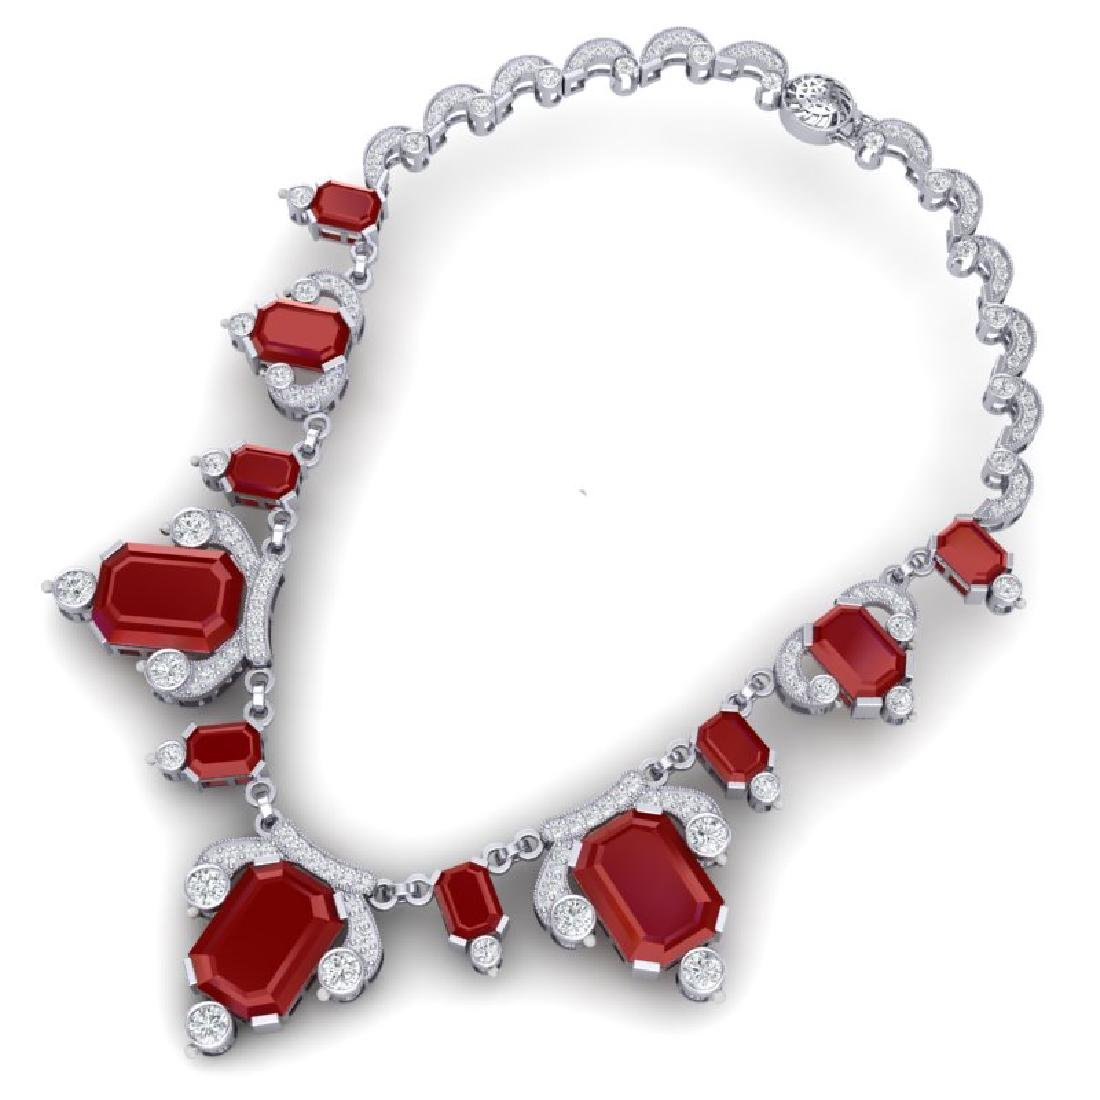 75.21 CTW Royalty Ruby & VS Diamond Necklace 18K White - 3